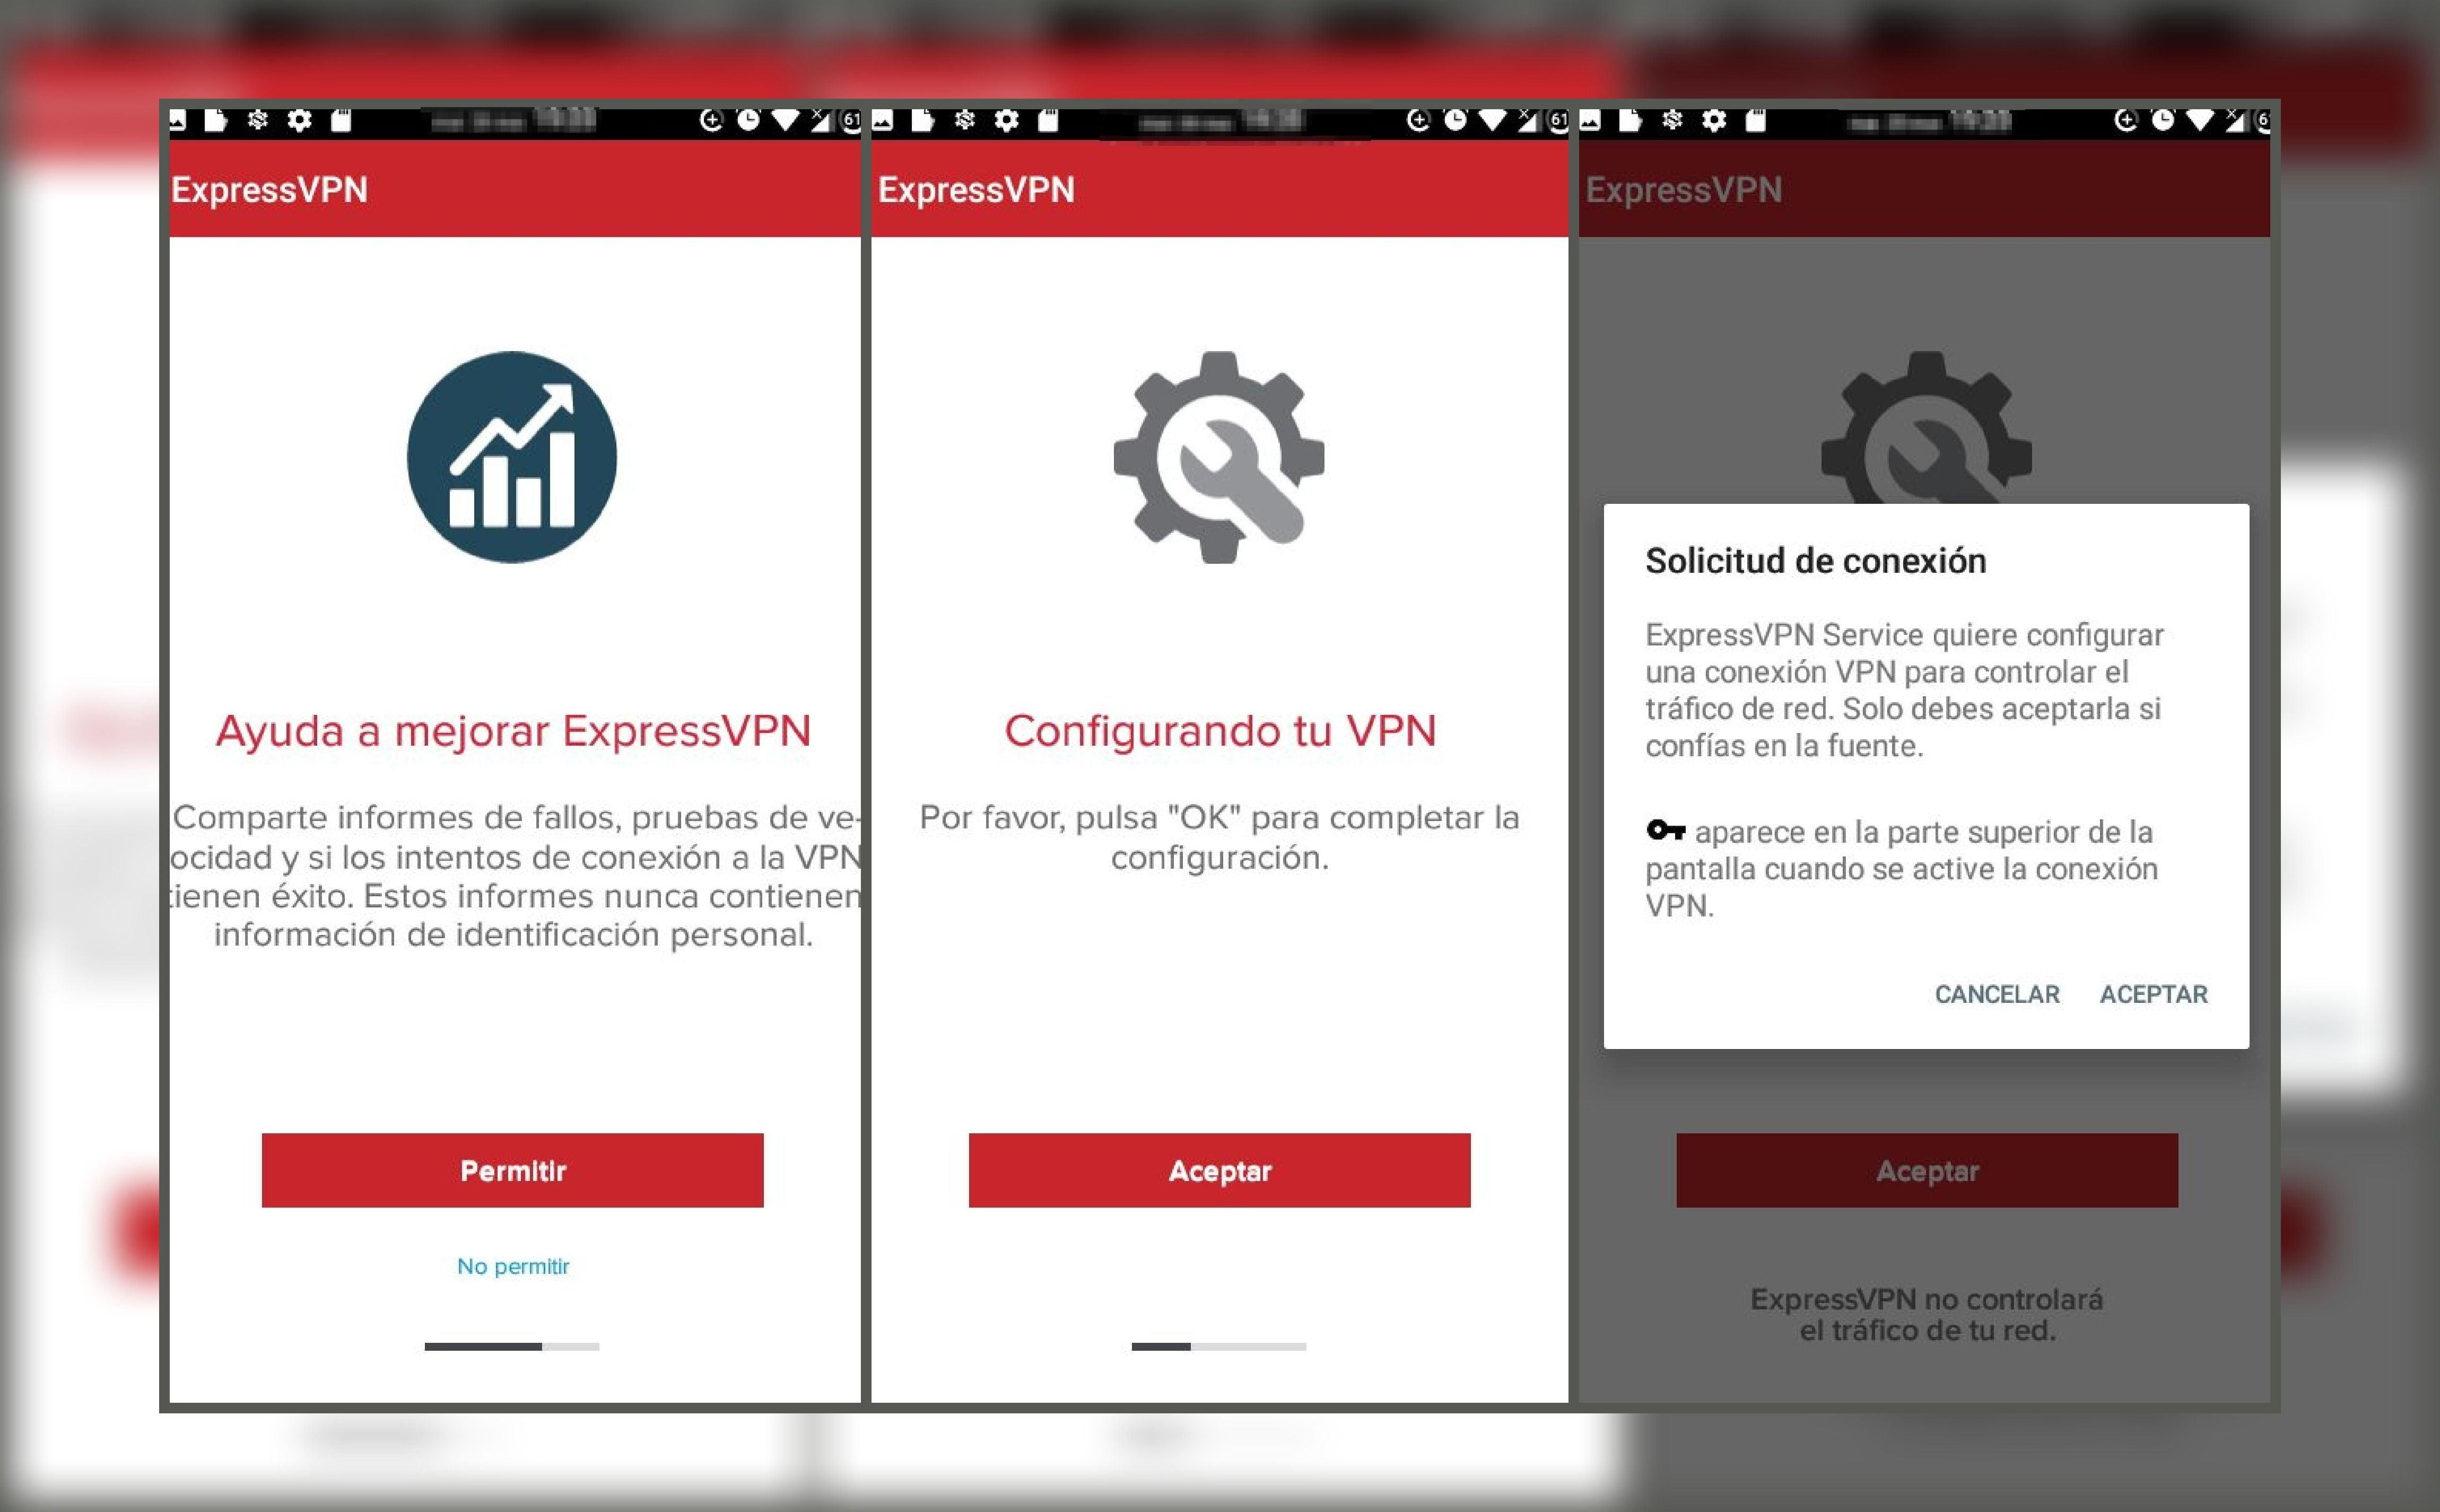 express vpn cuentas gratis